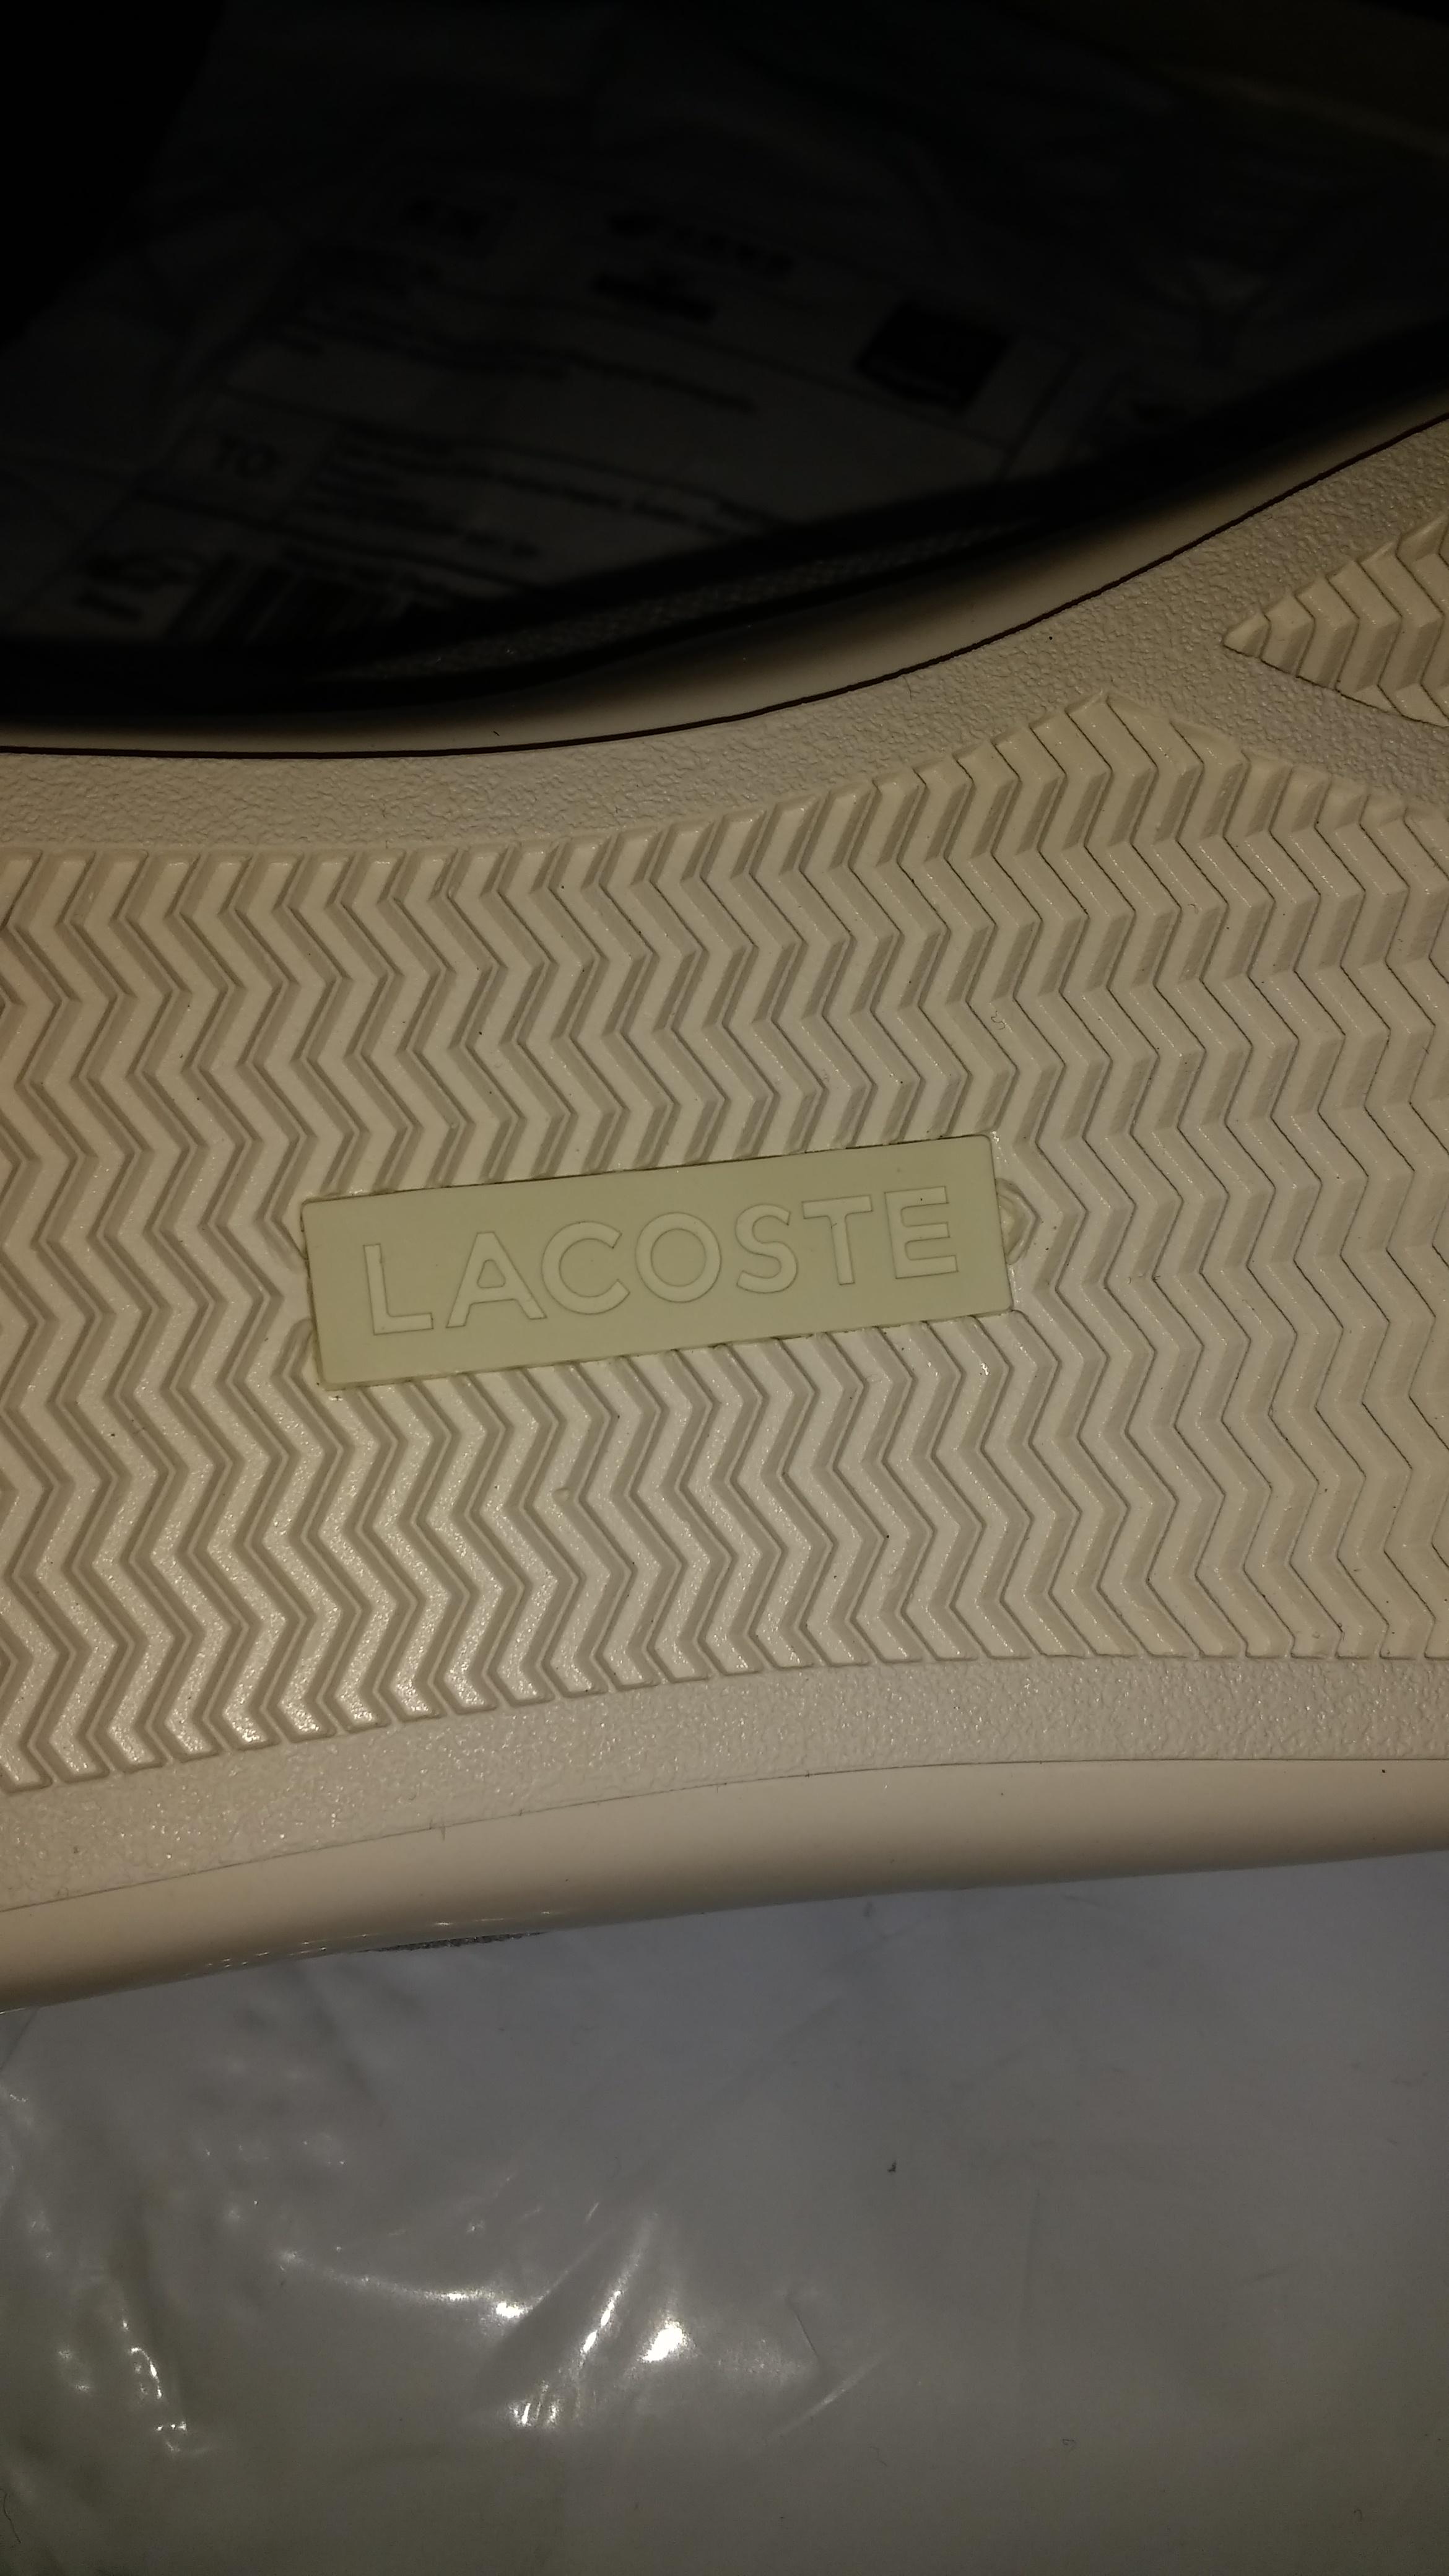 1da0bf004a56 Fake Lacoste shoes